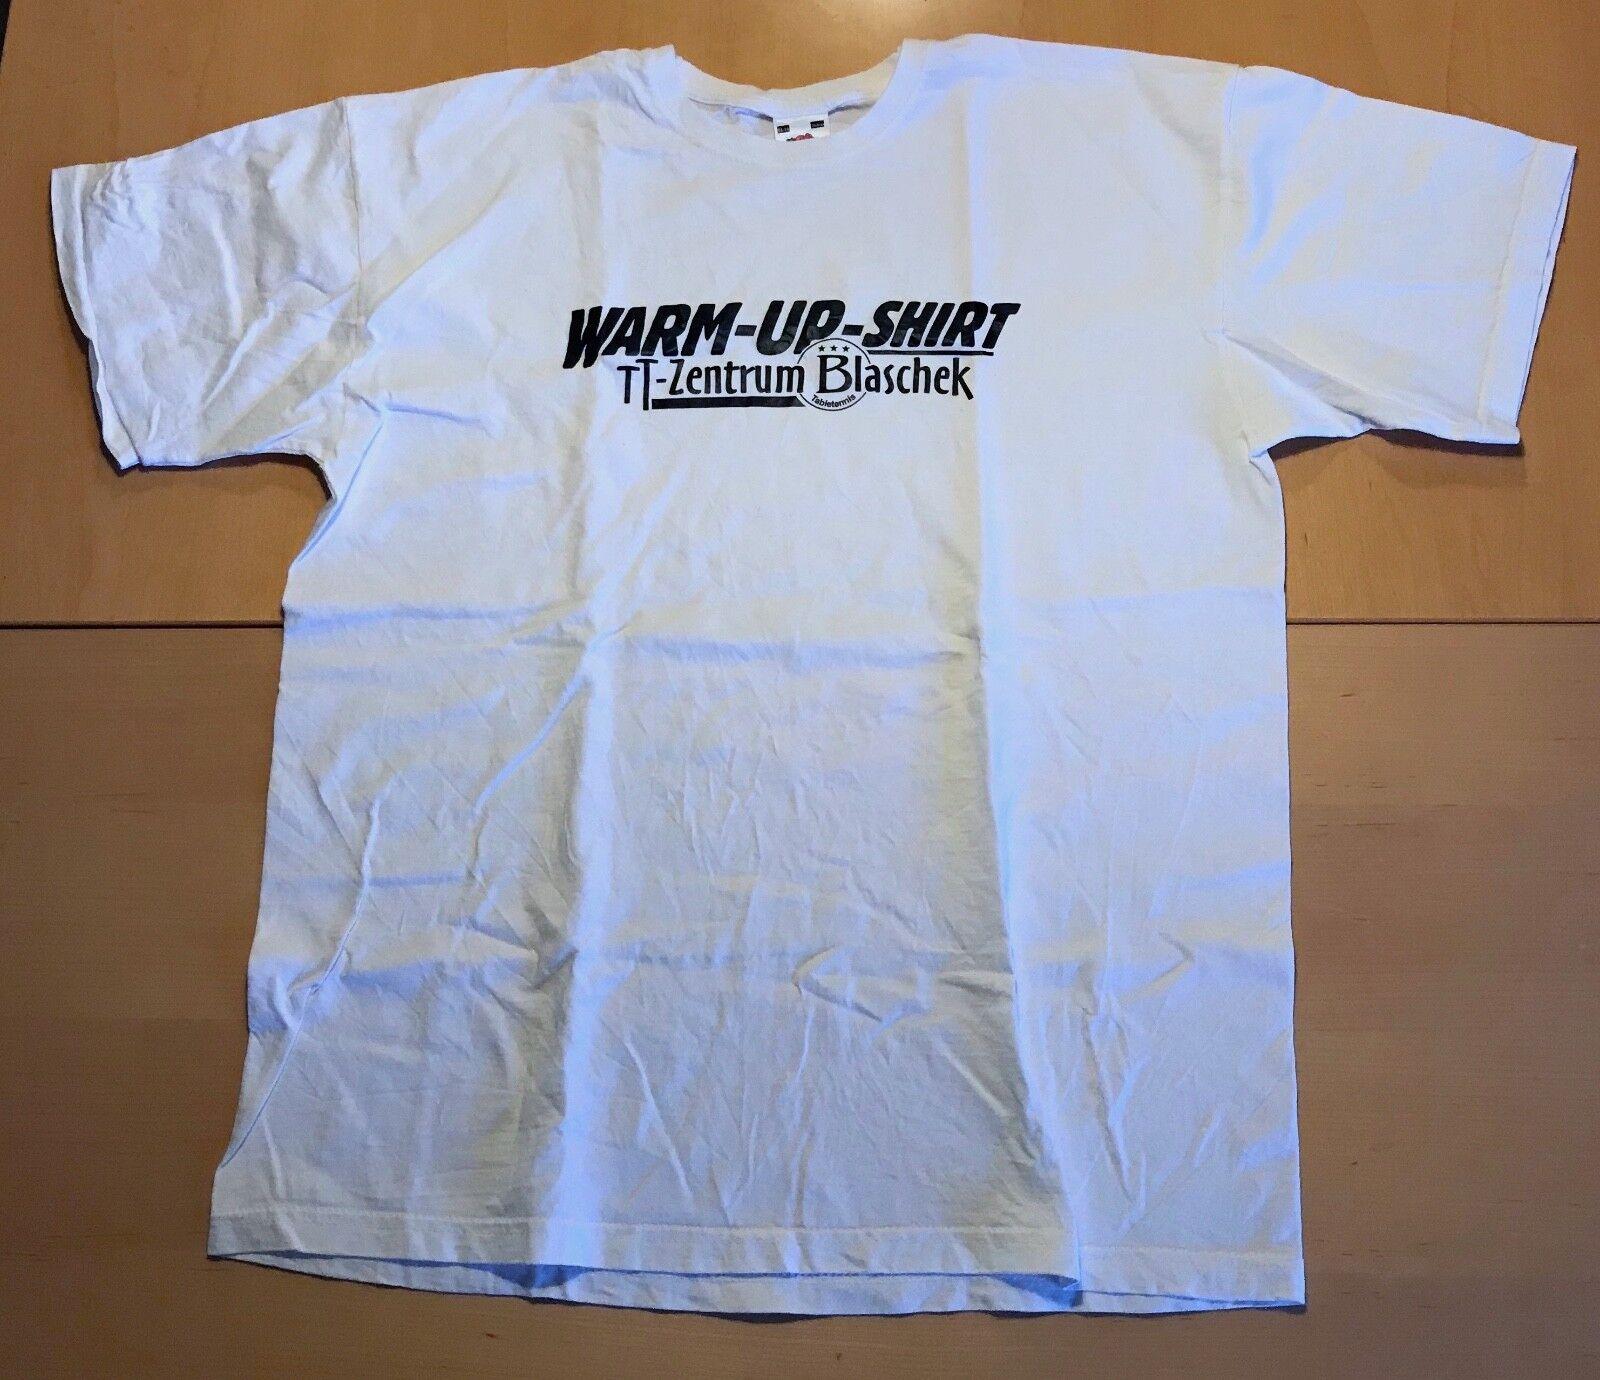 T-Shirt Kinder weiß Sport Shirt Größe Fruit of the Loom 14-15 Jahre Größe 164 cm